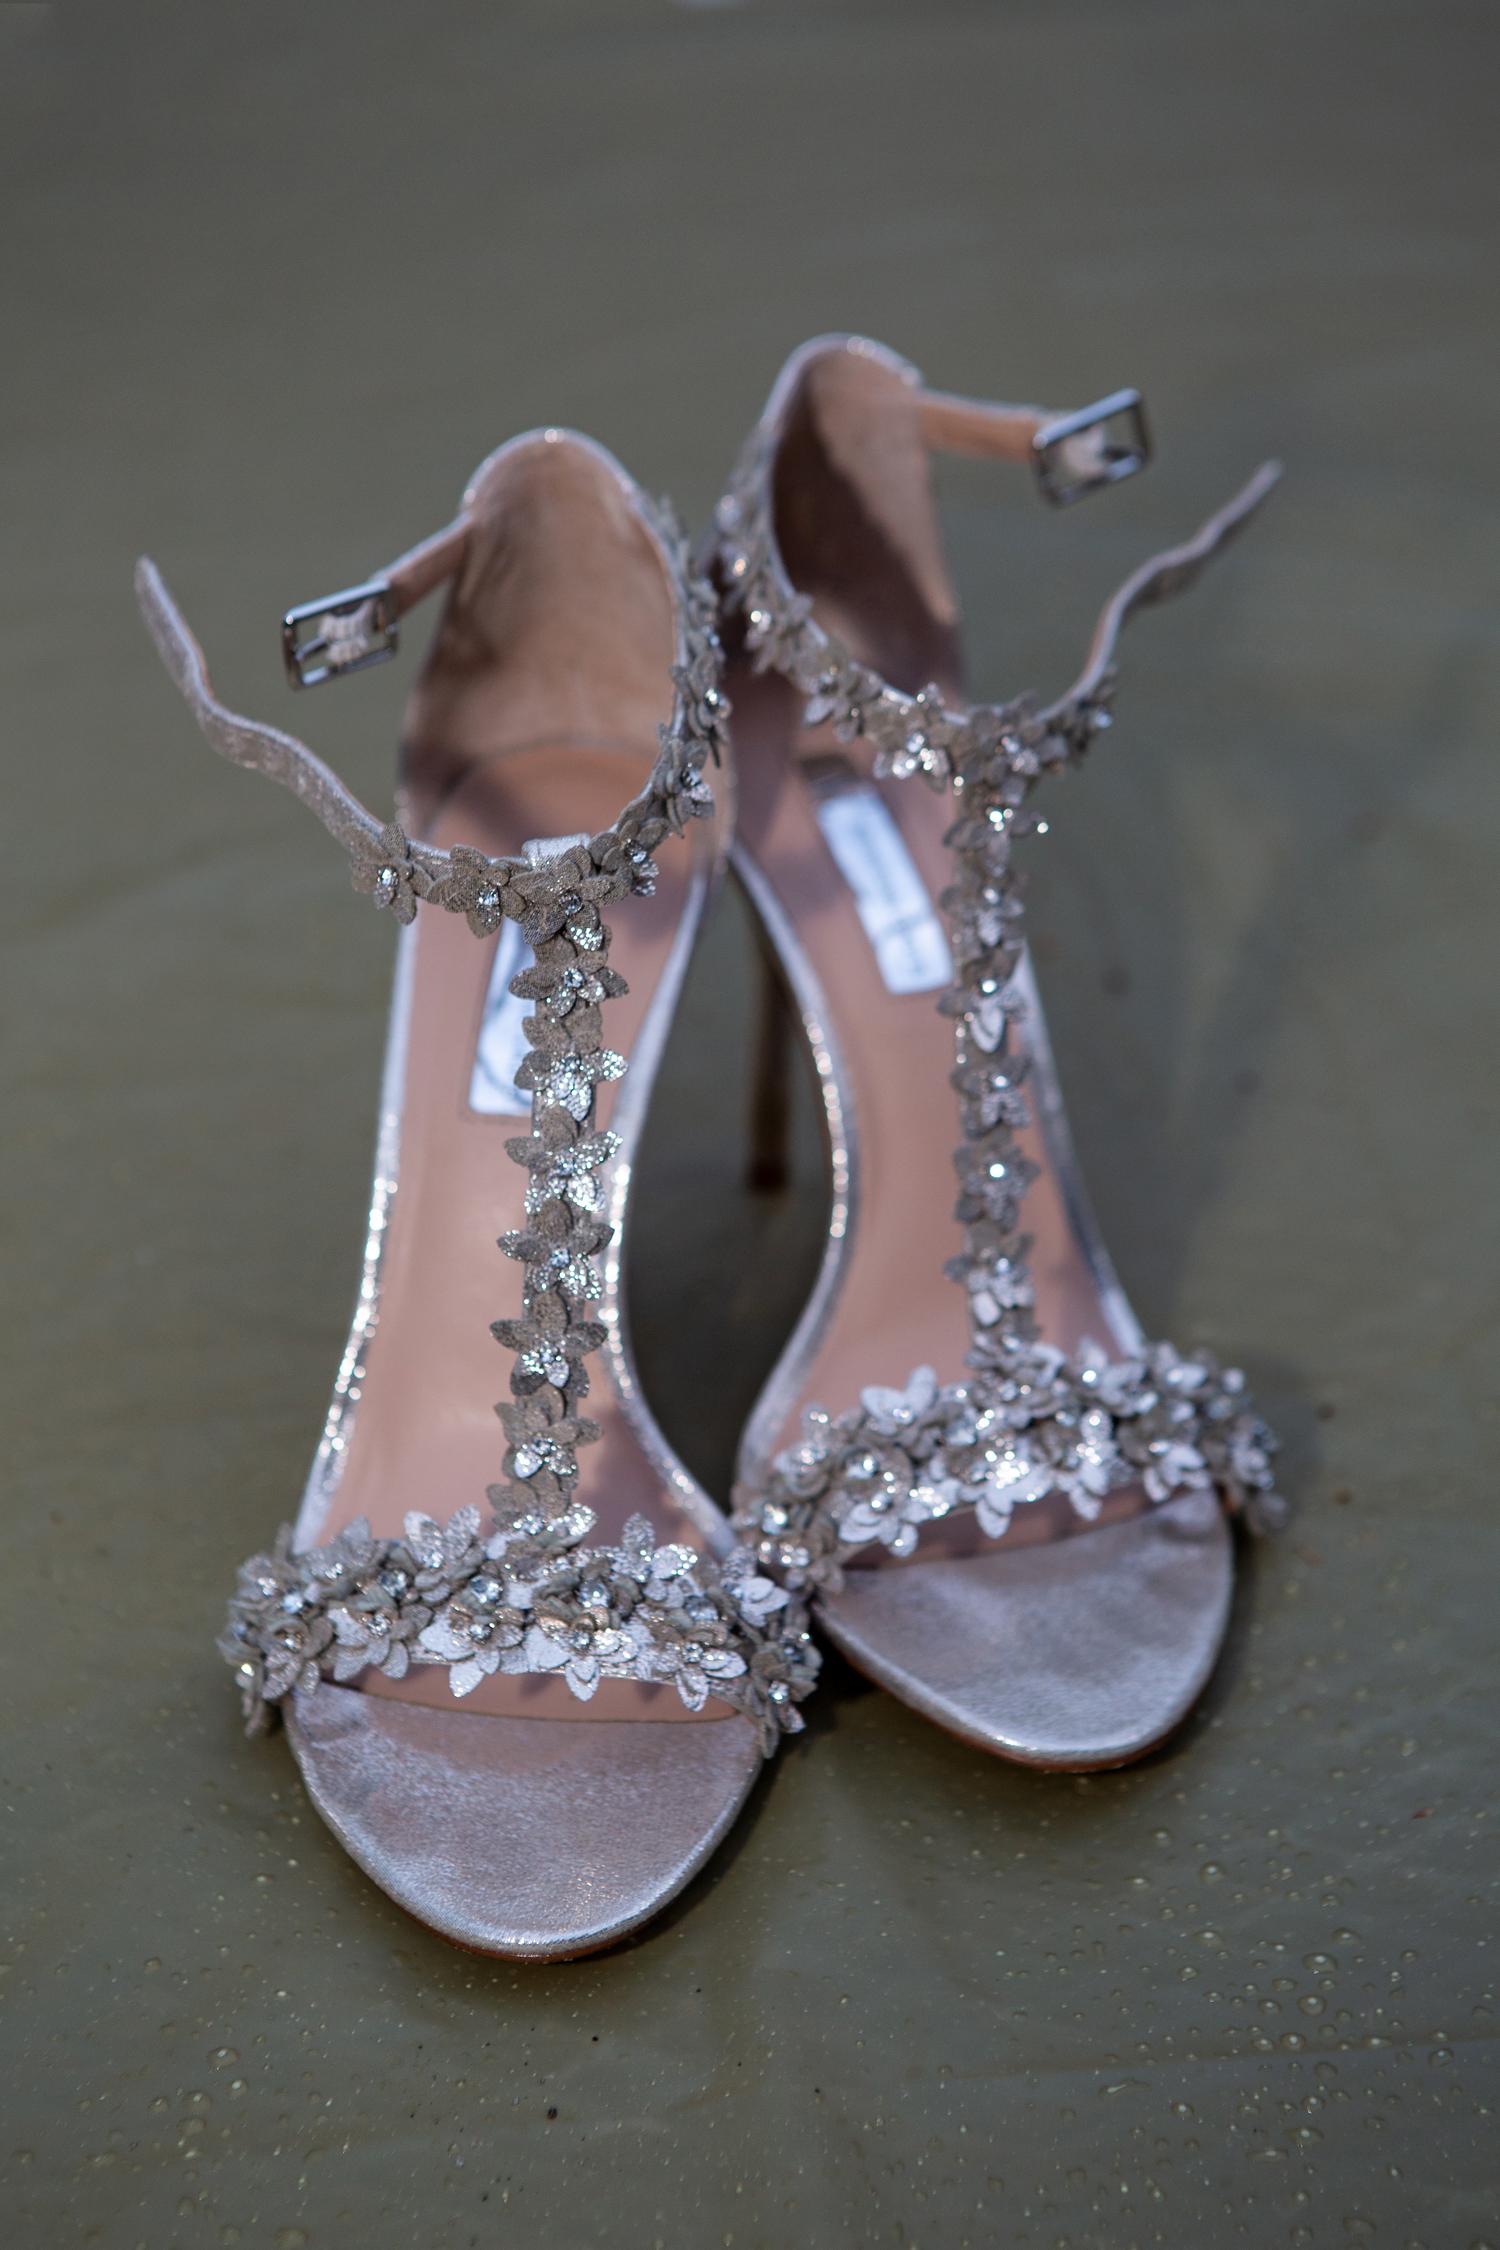 Shoes_6318.jpg